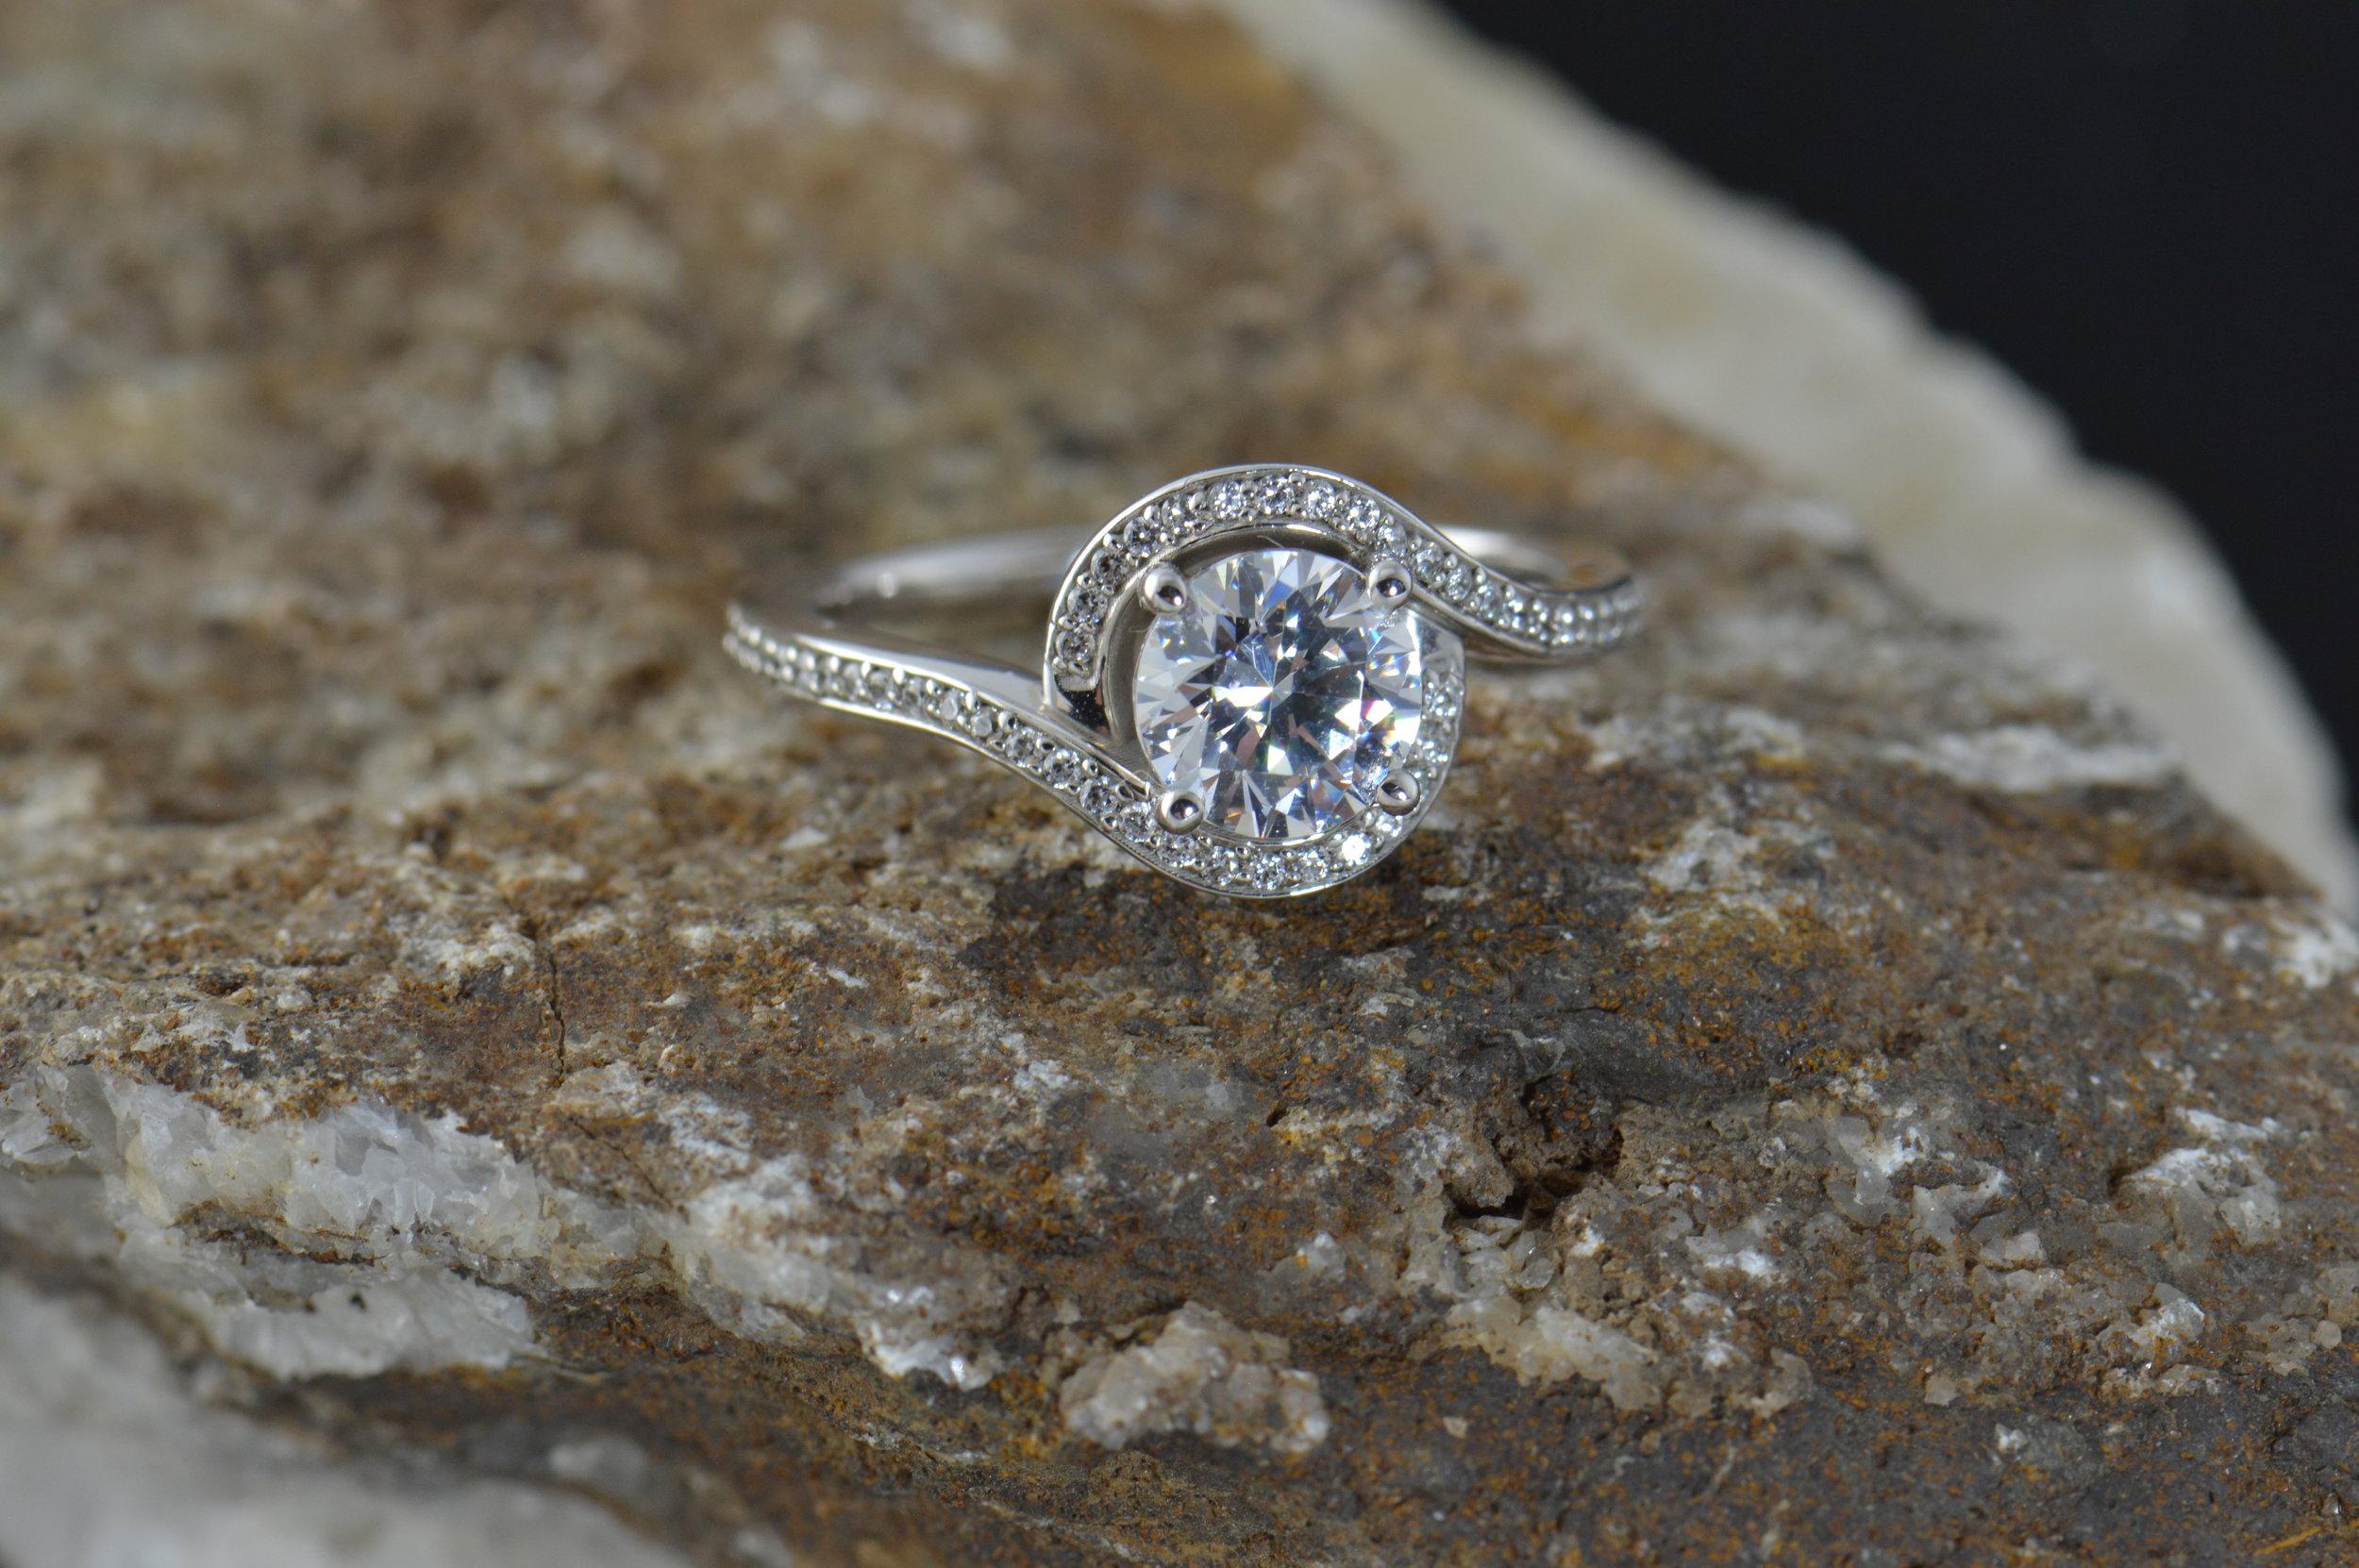 darvier-twist engagement-ring.JPG